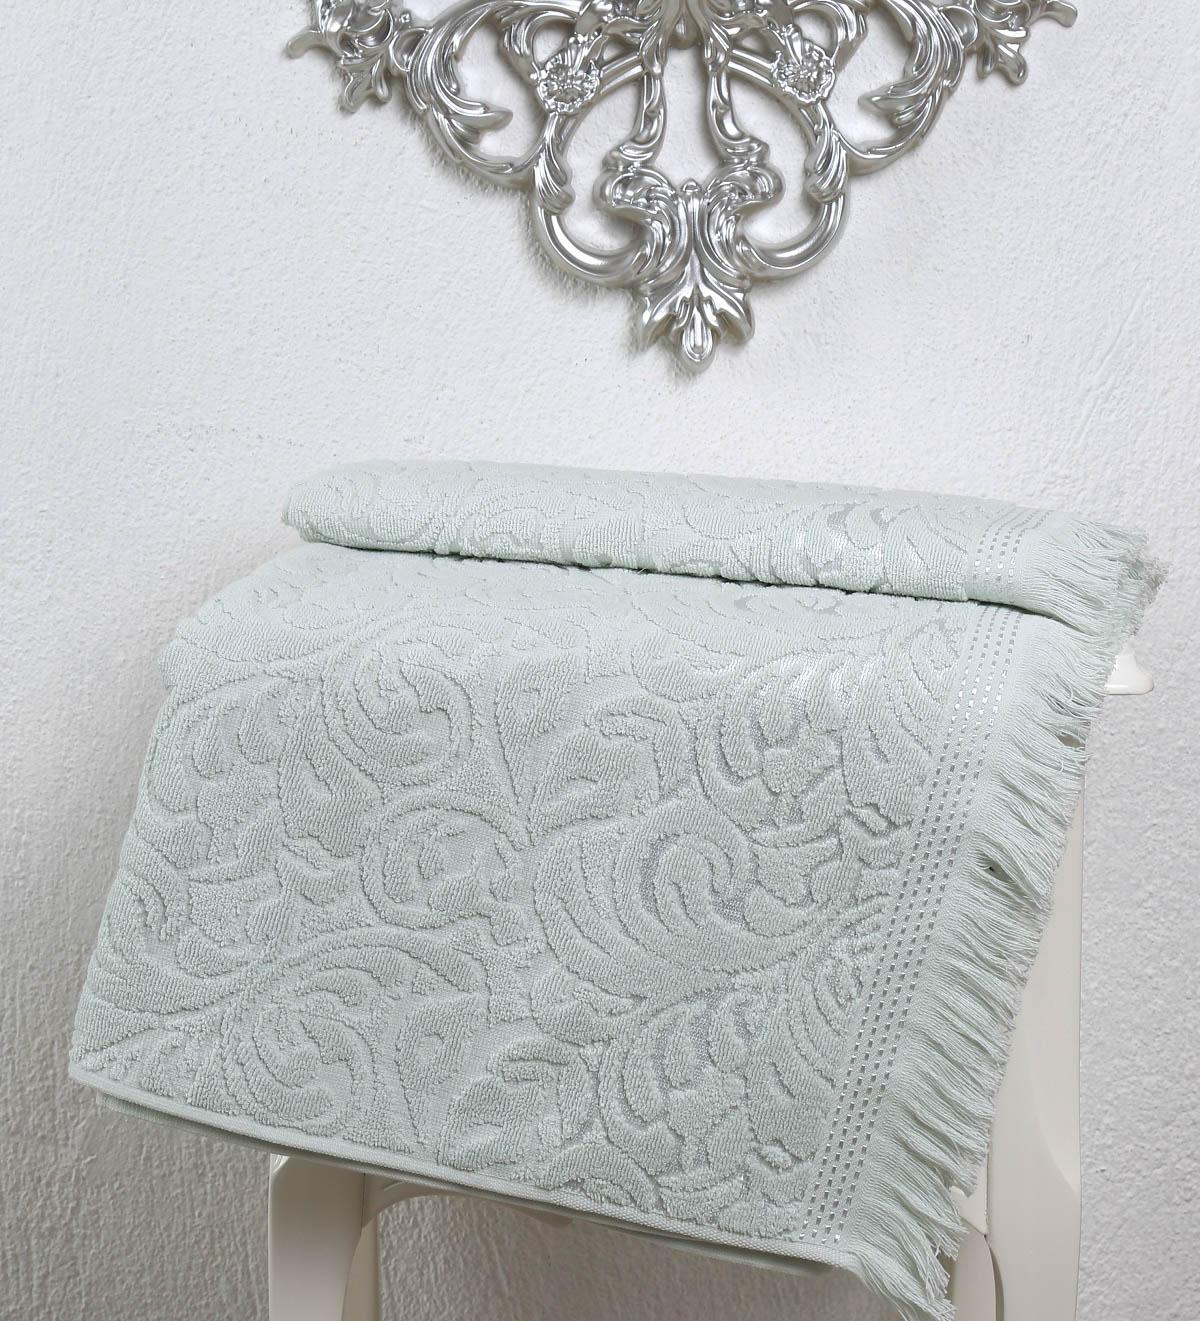 Полотенца Karna Полотенце Esra Цвет: Светло-Зеленый (70х140 см) полотенца karna полотенце iteka цвет коричневый 70х140 см